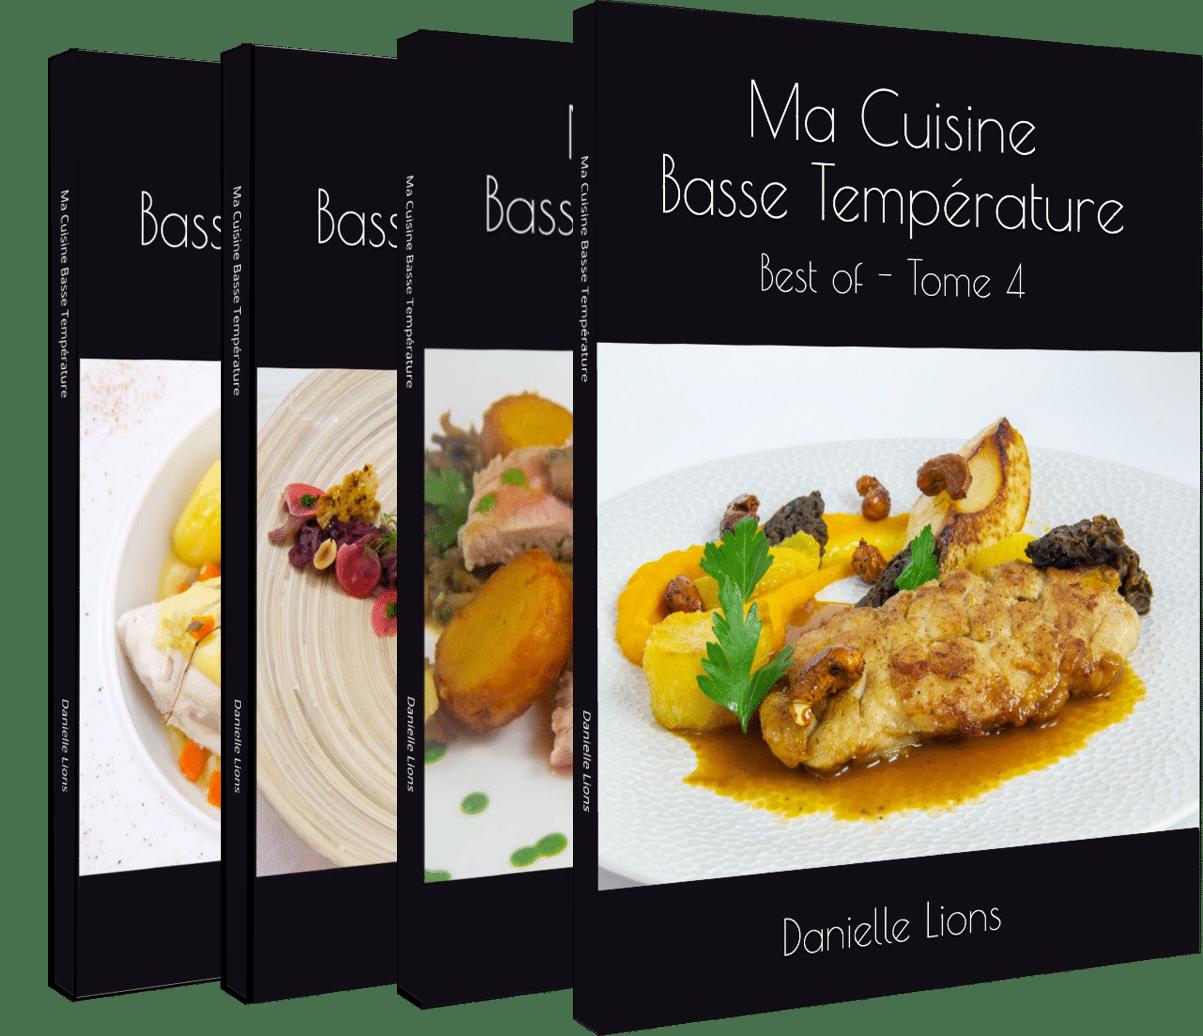 Le Tome 4 De Ma Collection Ma Cuisine Basse Temperature Vient De